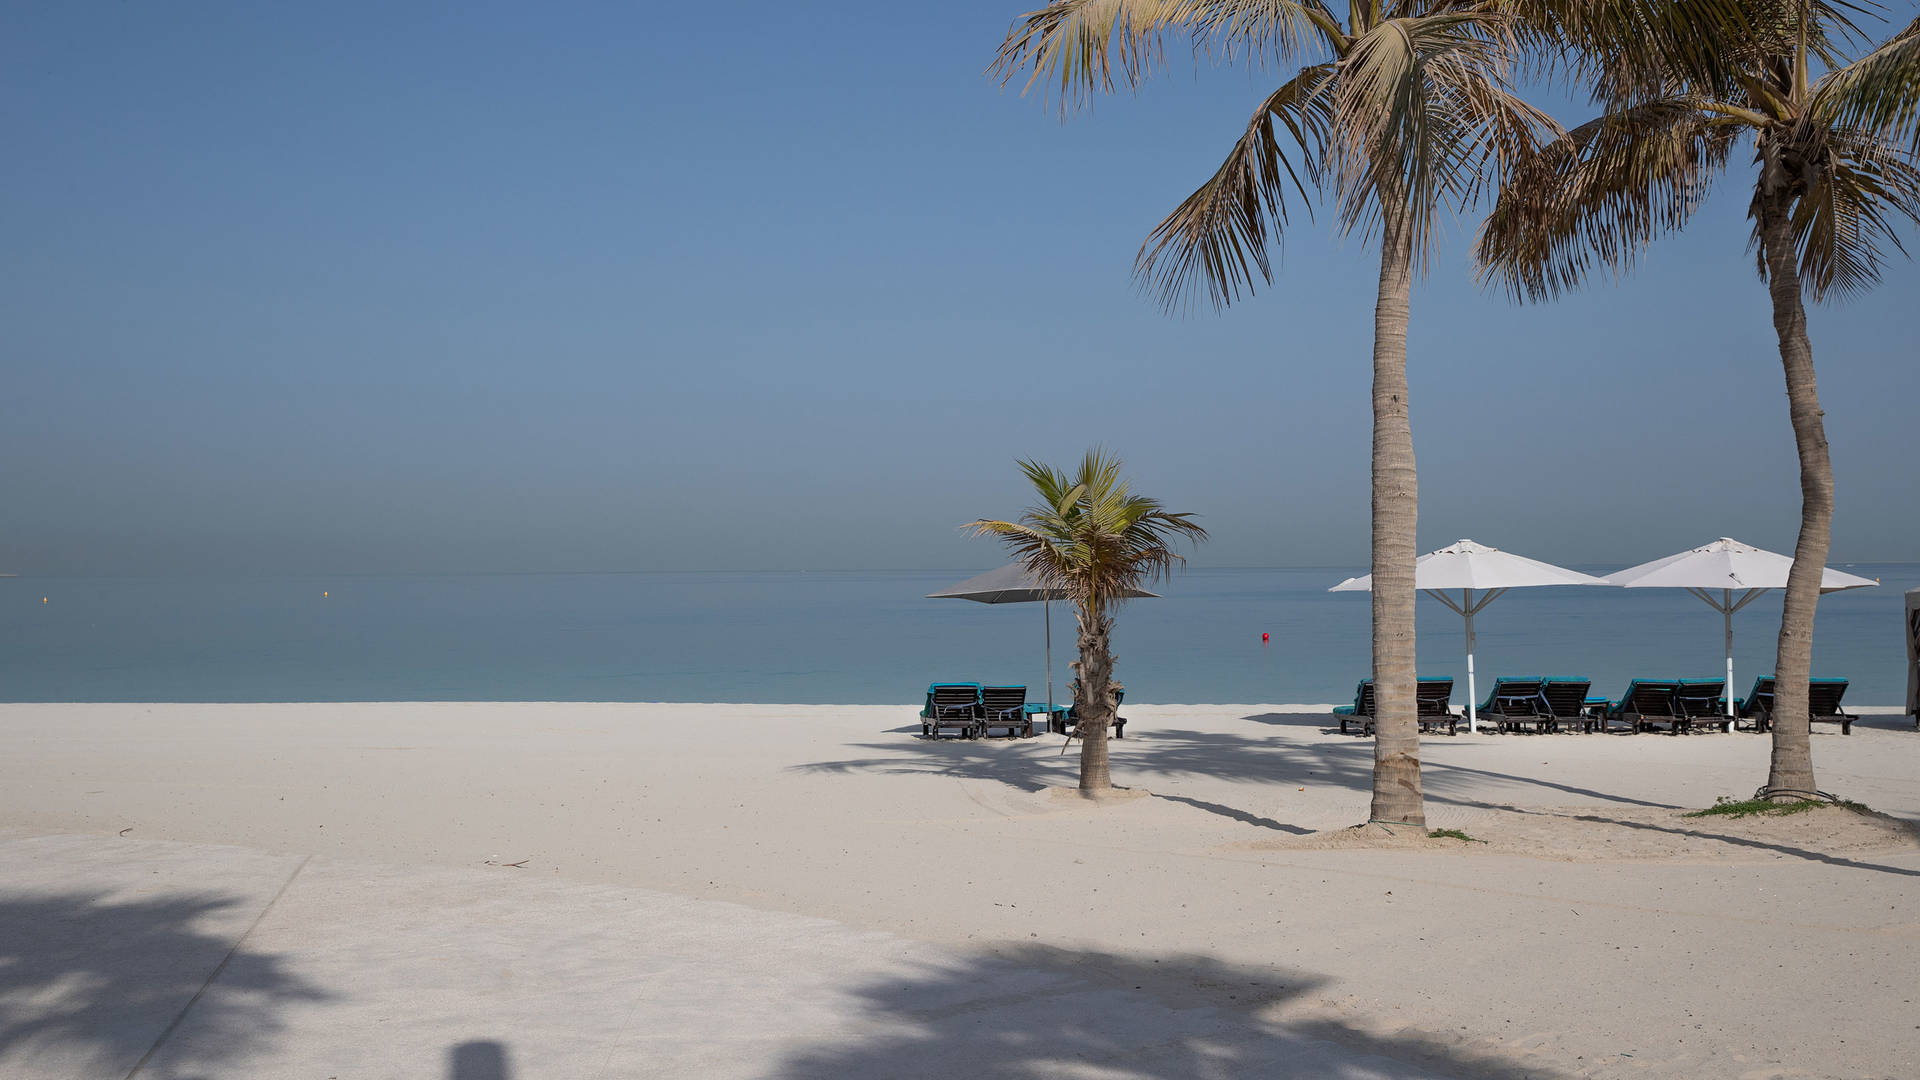 View of the beach in Dubai